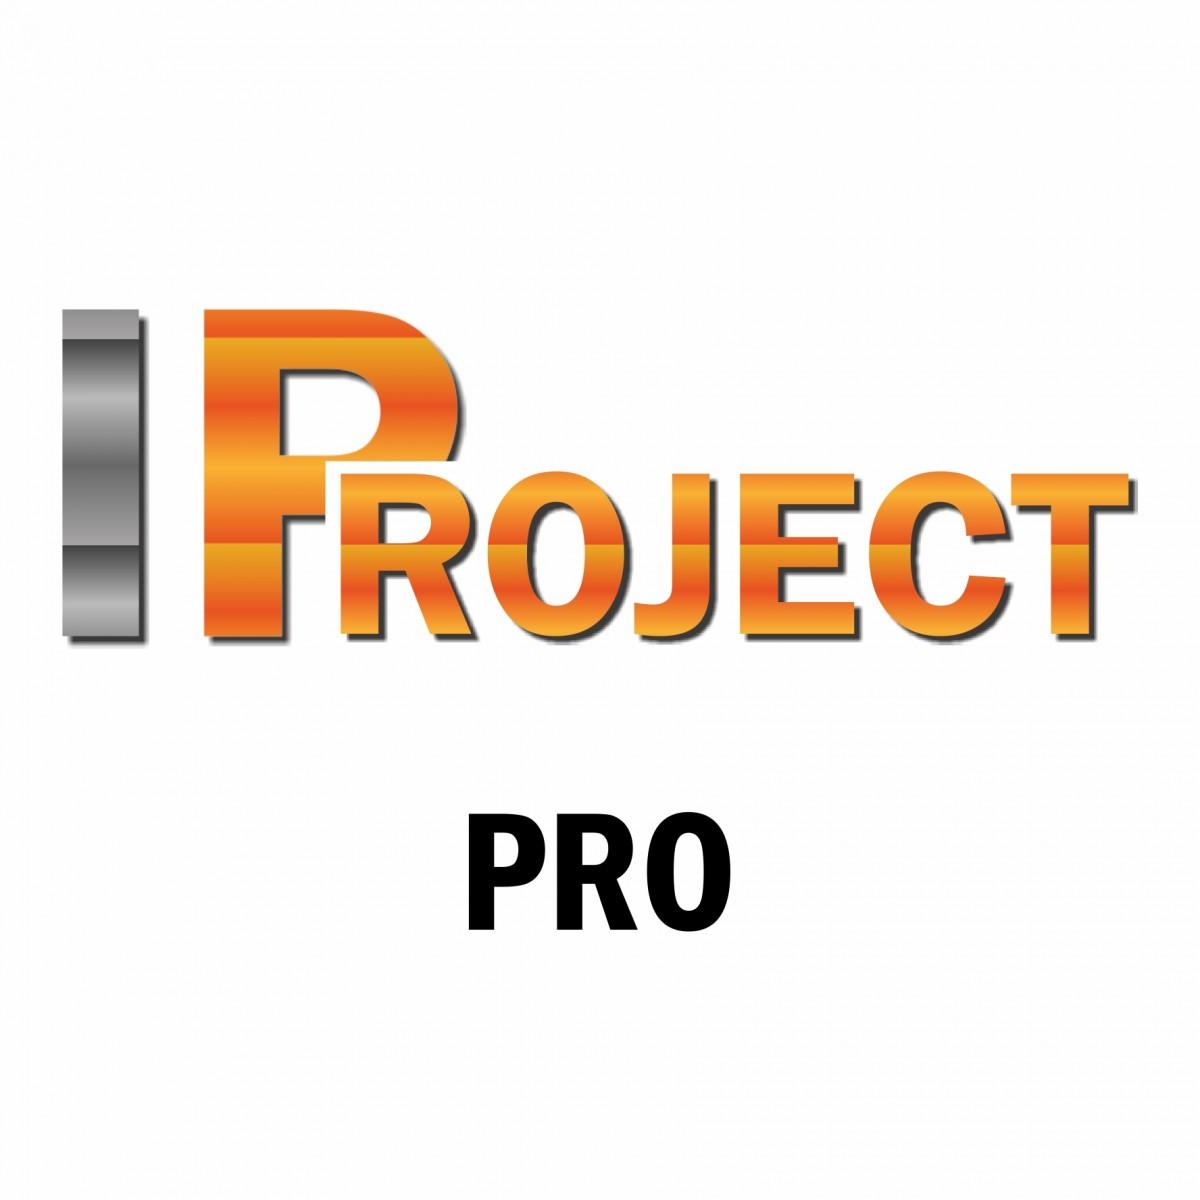 Программное обеспечение Satvision IProject PRO (Satvision/Divisat)